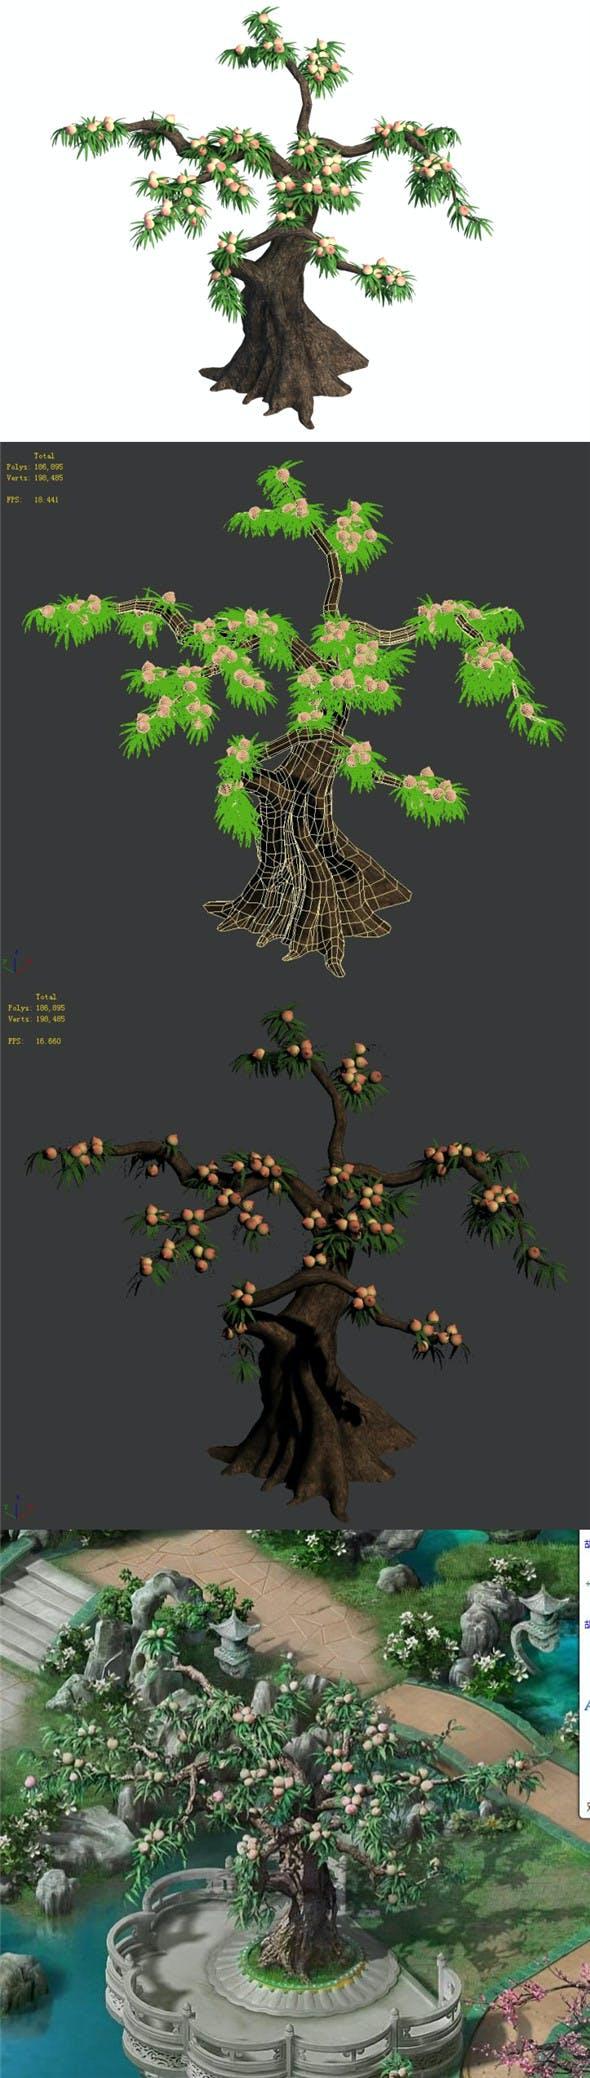 Plant - Peach 033 - 3DOcean Item for Sale